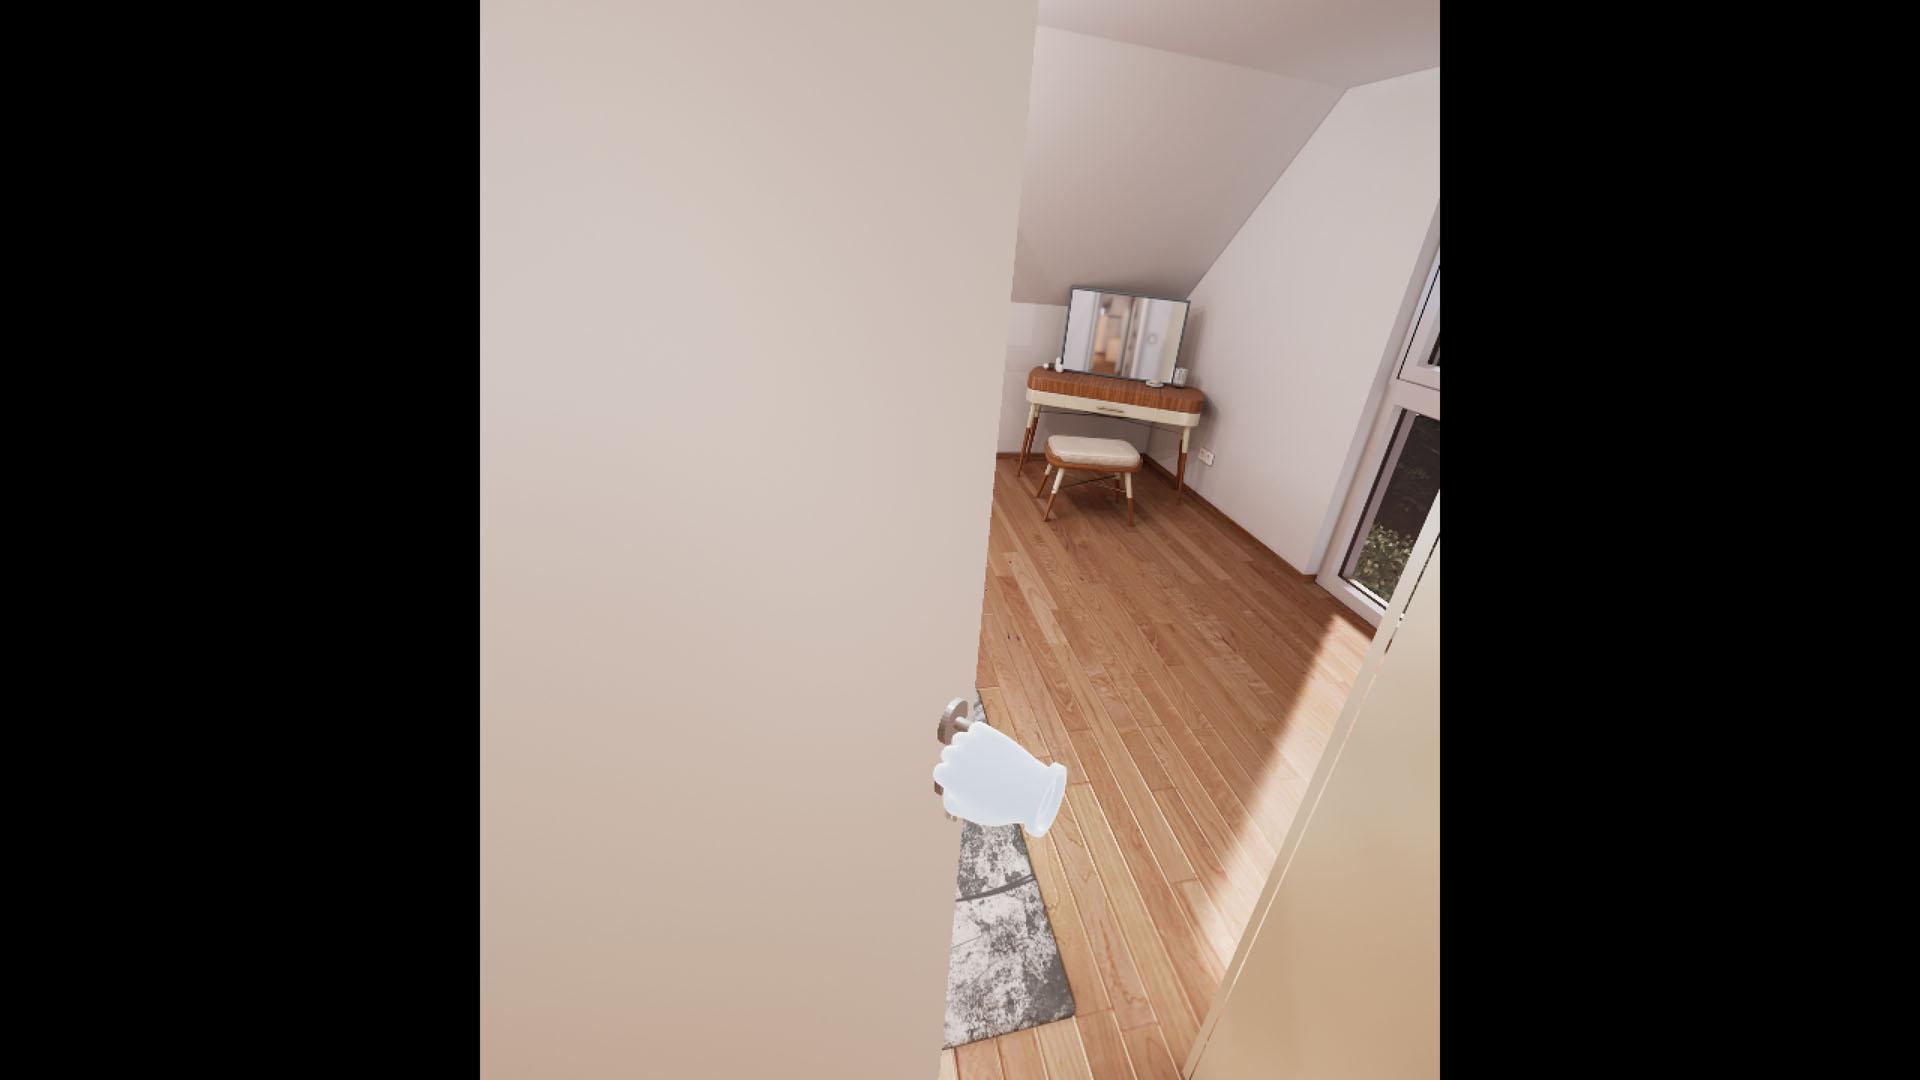 VR Tour - Tür öffnen